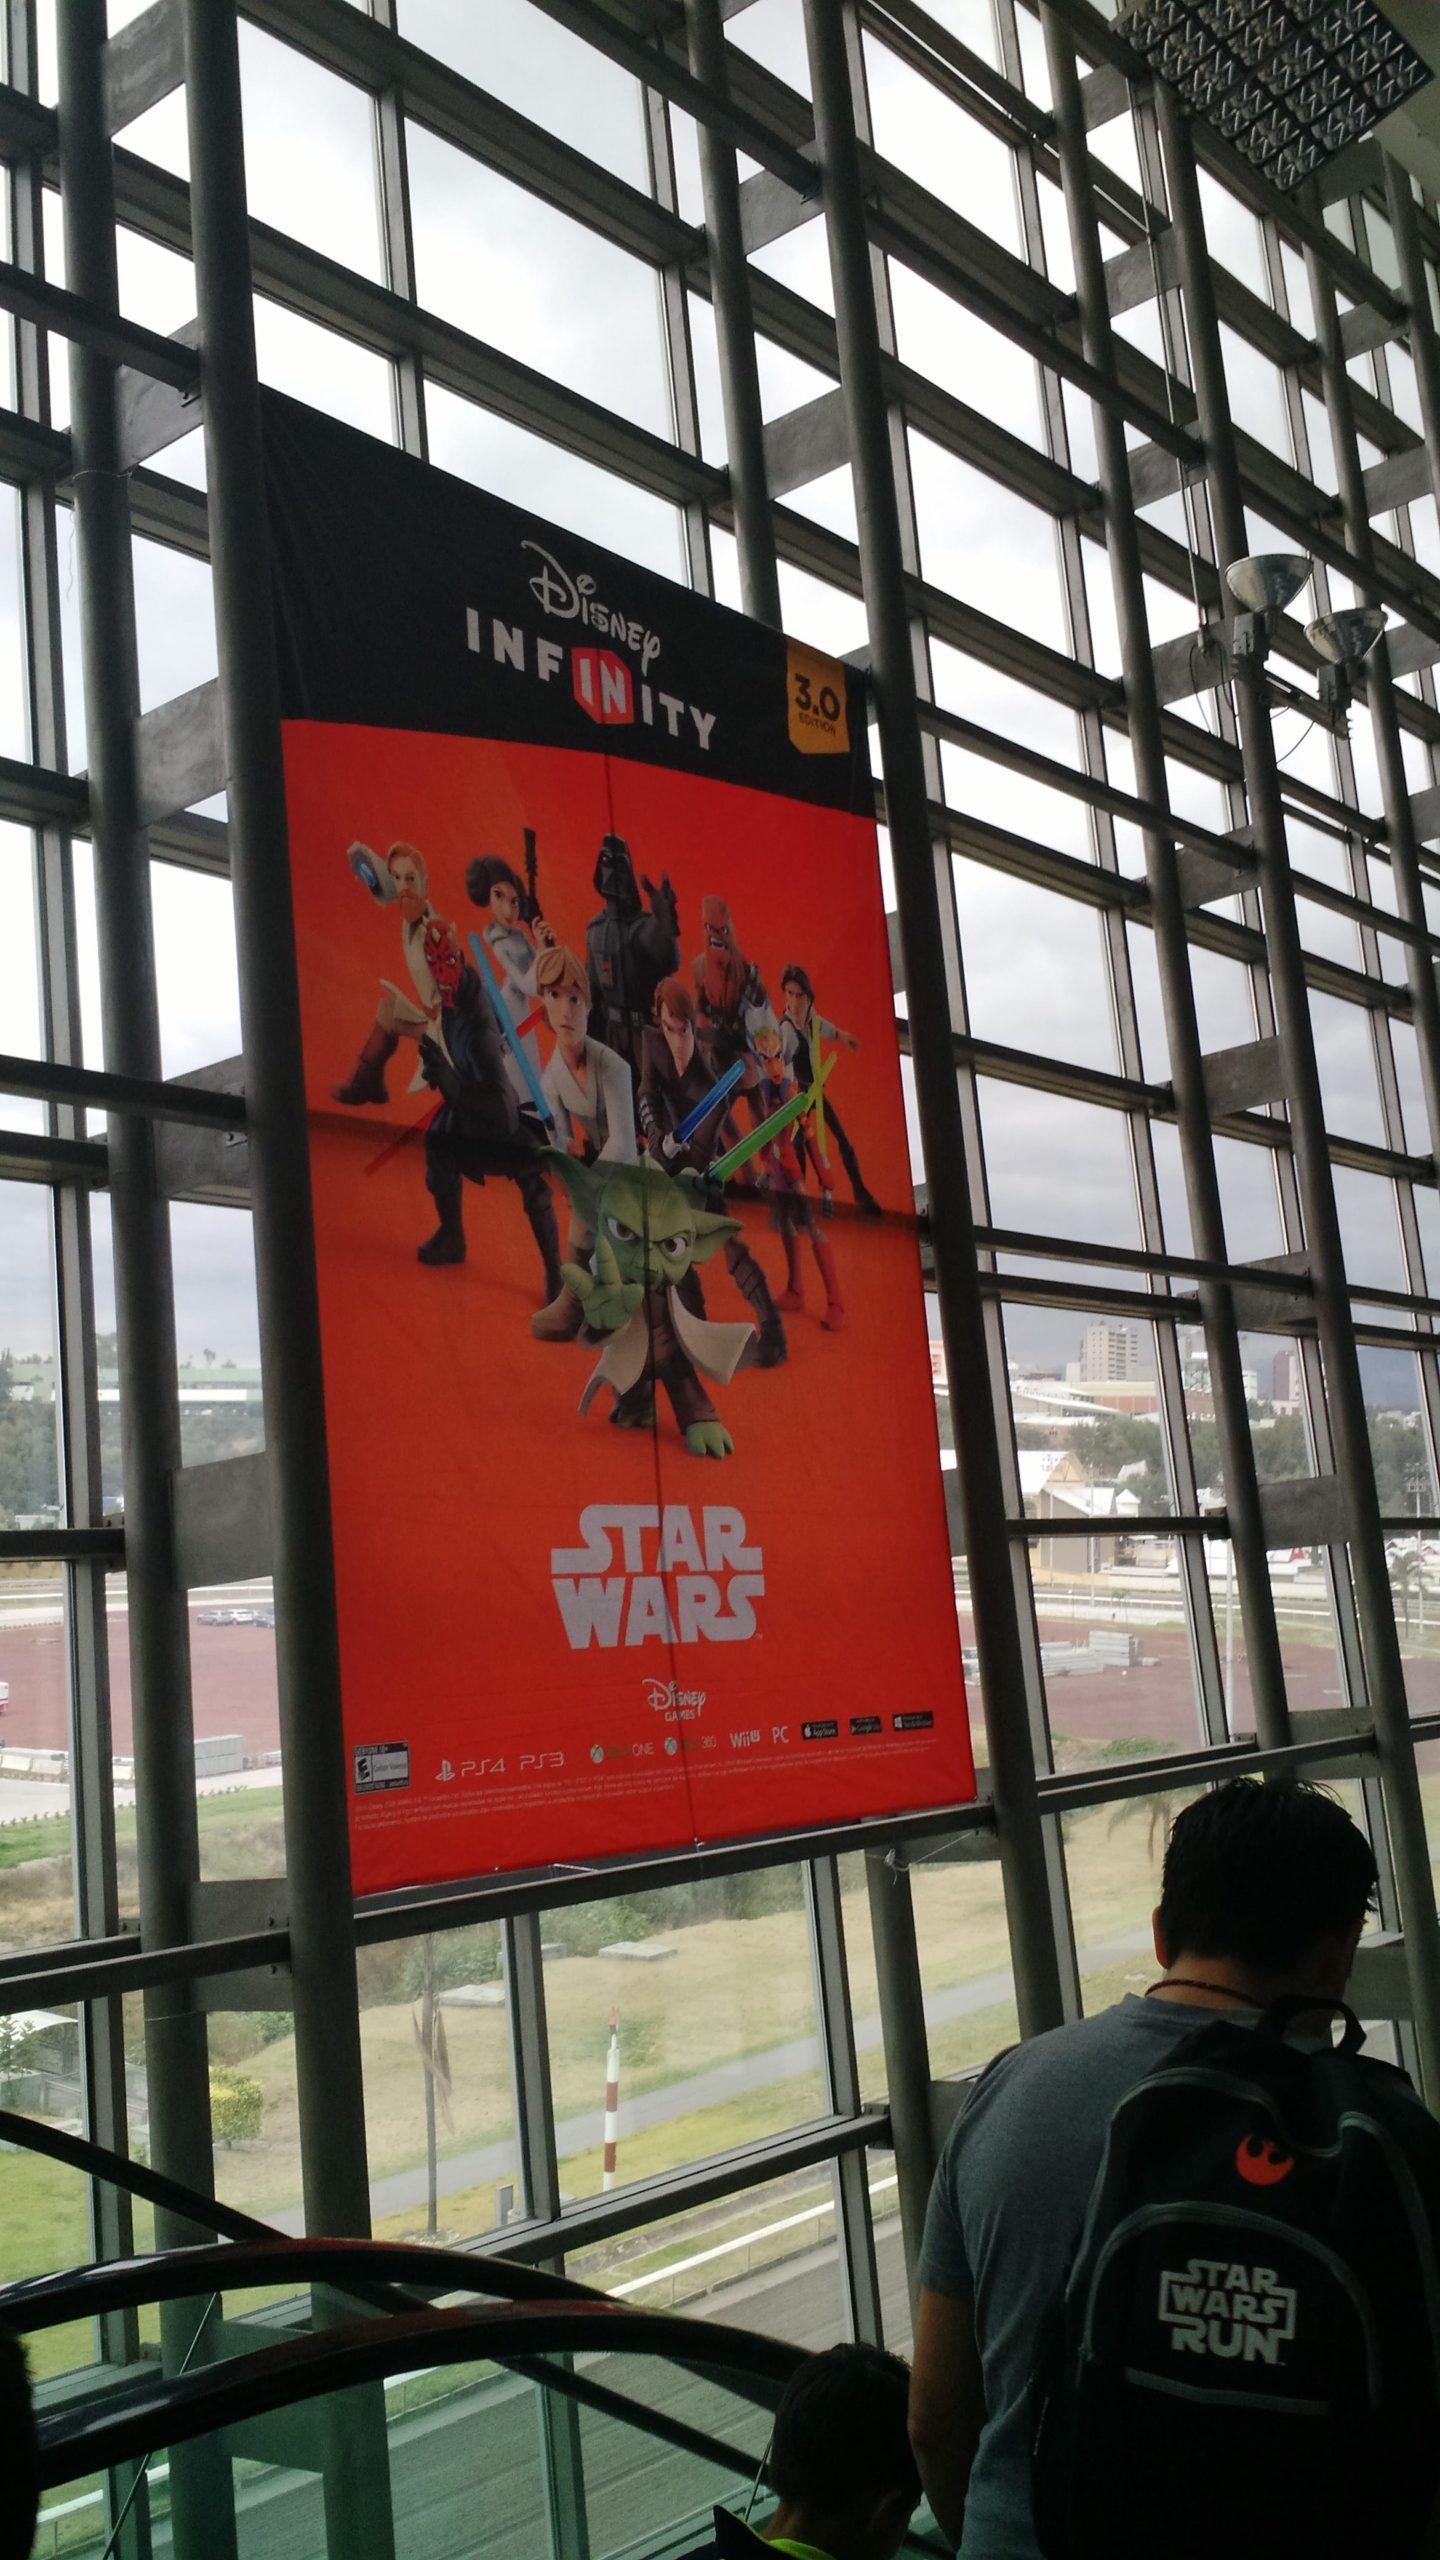 Star wars en disney infinity 3.0